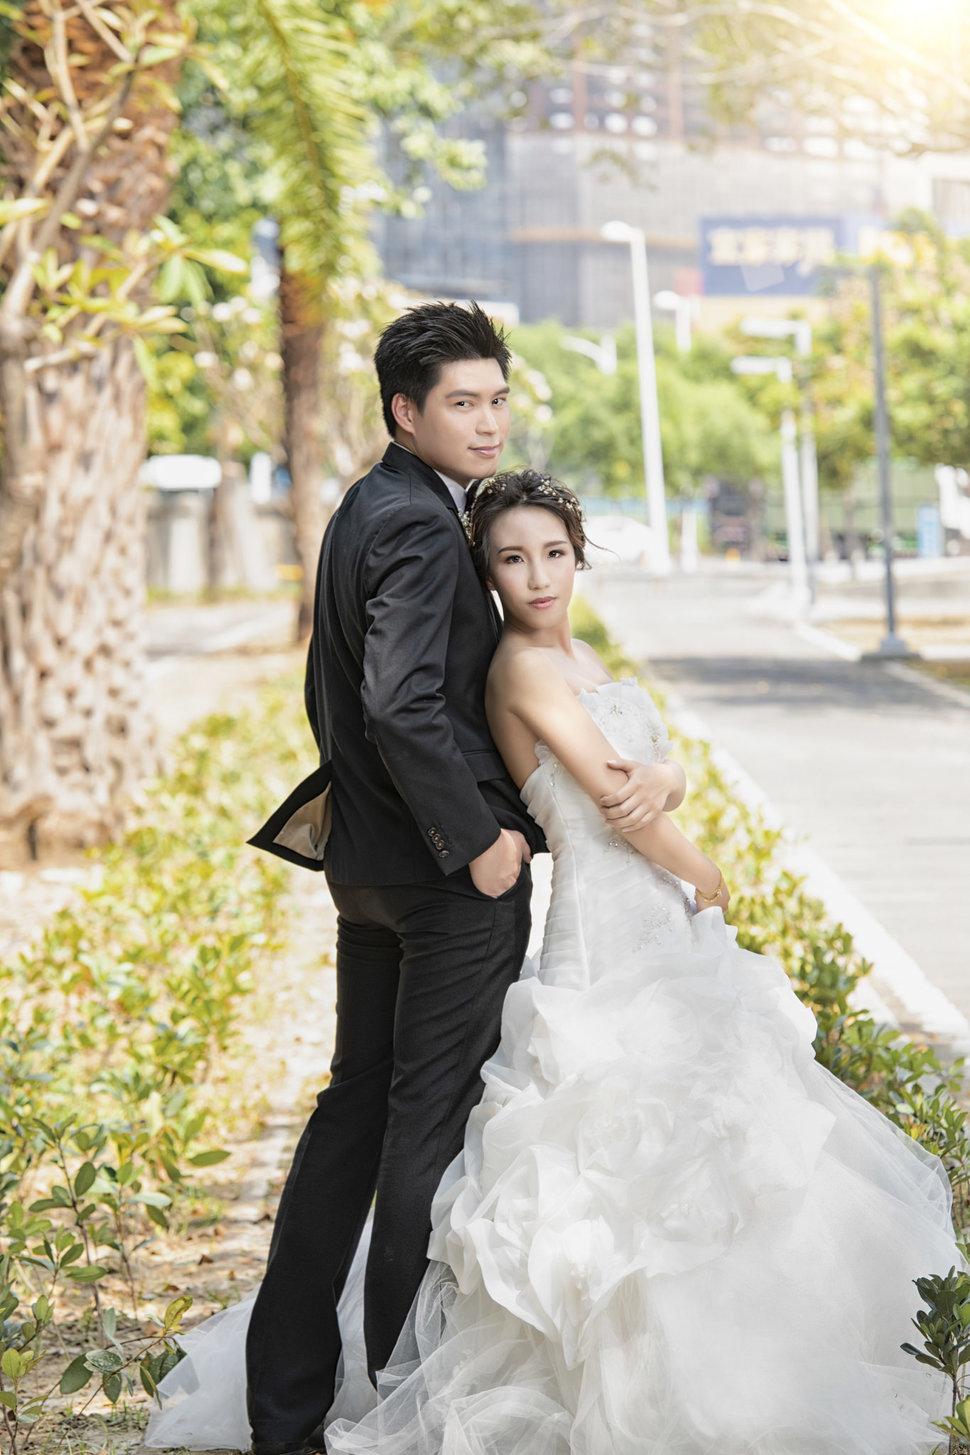 28095126018_33b951ac52_k - 全台最便宜-45DESIGN四五婚紗禮服《結婚吧》